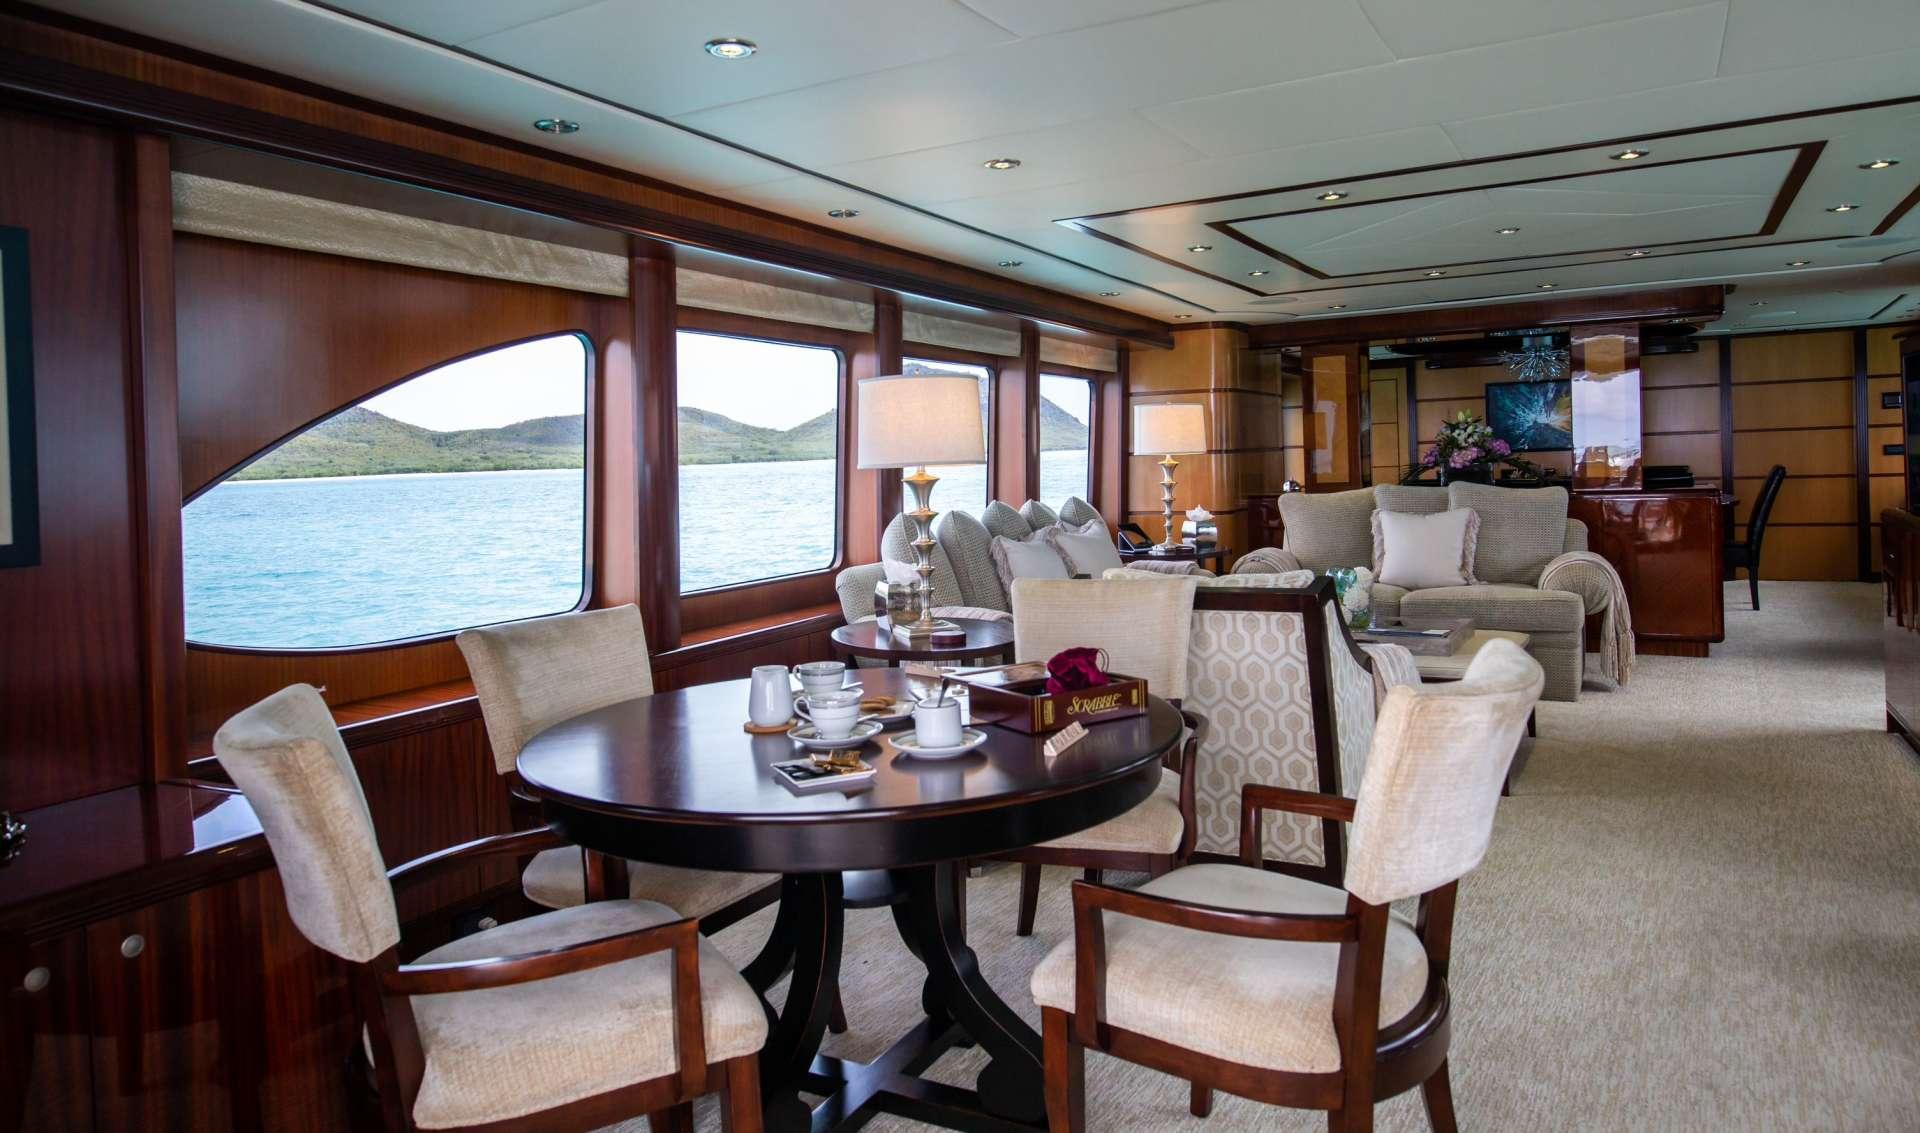 Power Yacht 'Power', 11 PAX, 9 Crew, 141.00 Ft, 43.00 Meters, Built 2012, ., Refit Year 2018